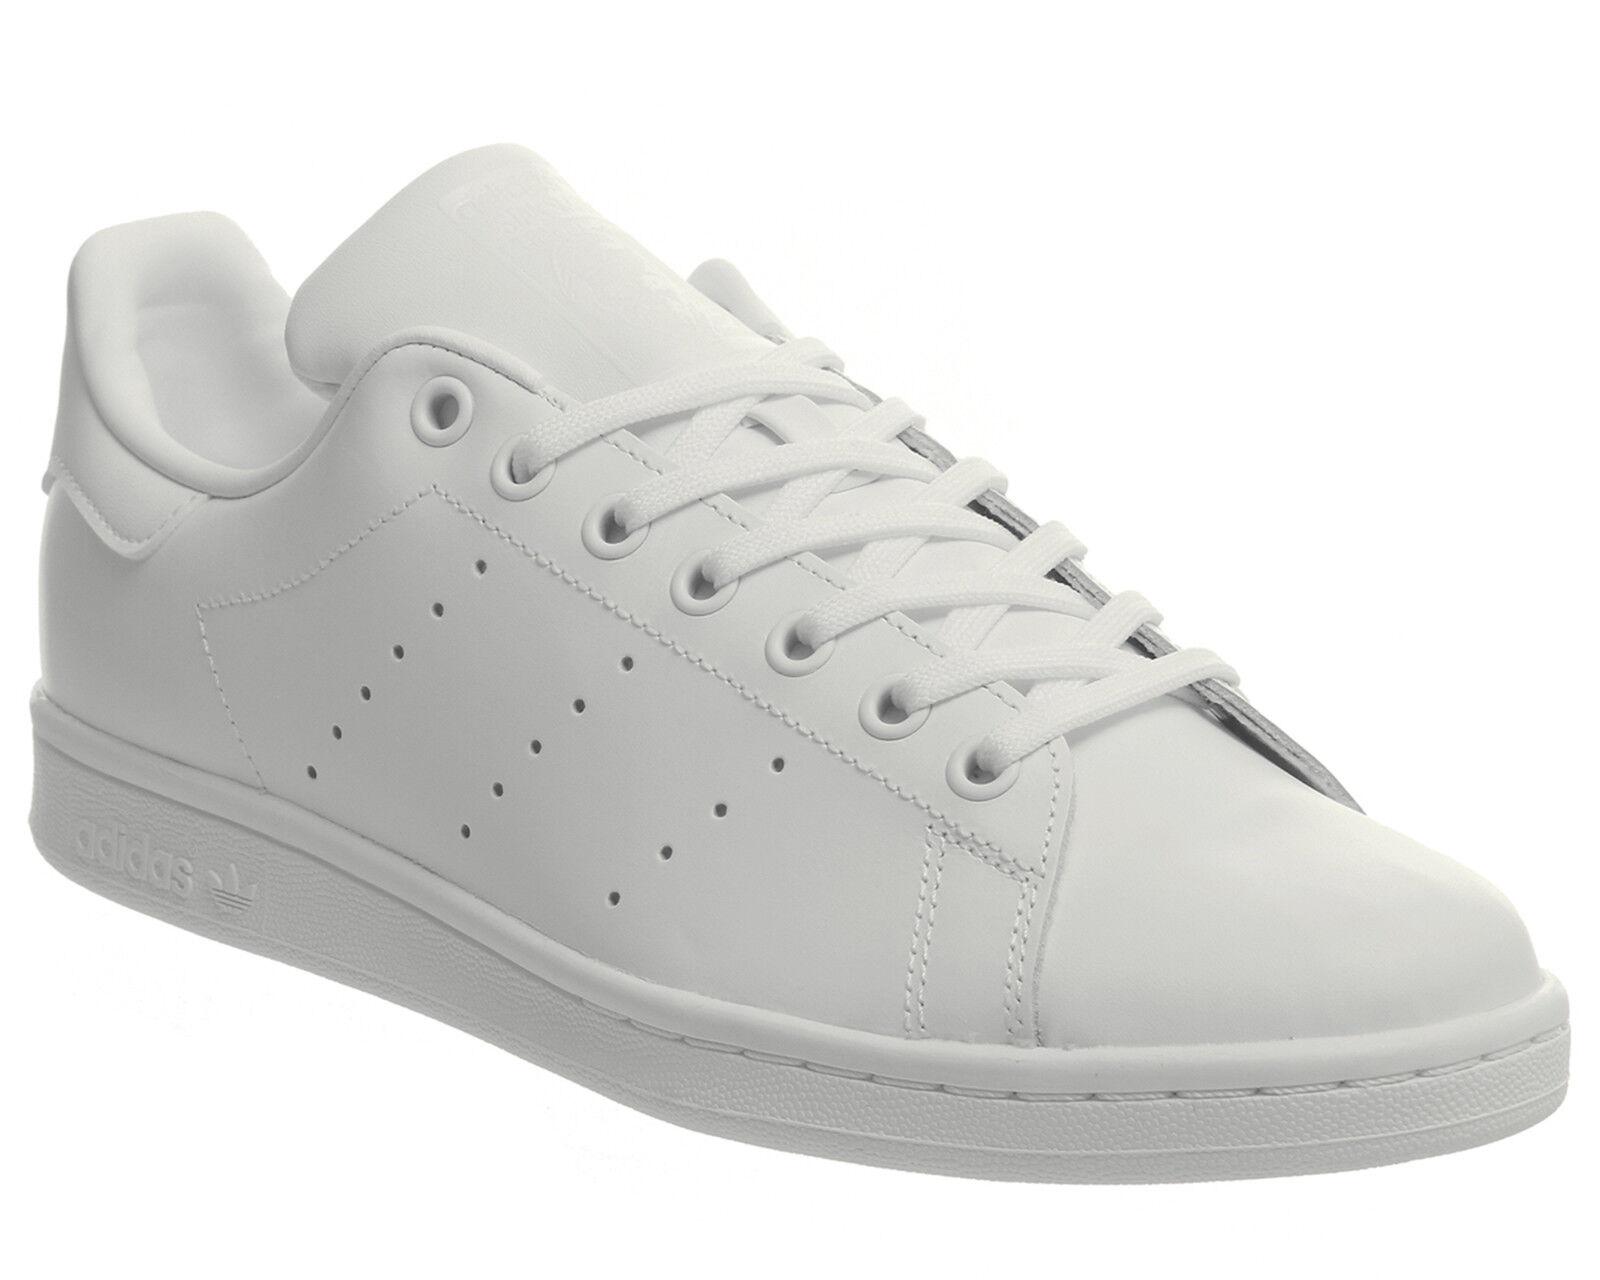 Da Uomo Adidas Stan Smith Scarpe da ginnastica Triplo Scarpe Da Ginnastica Bianco